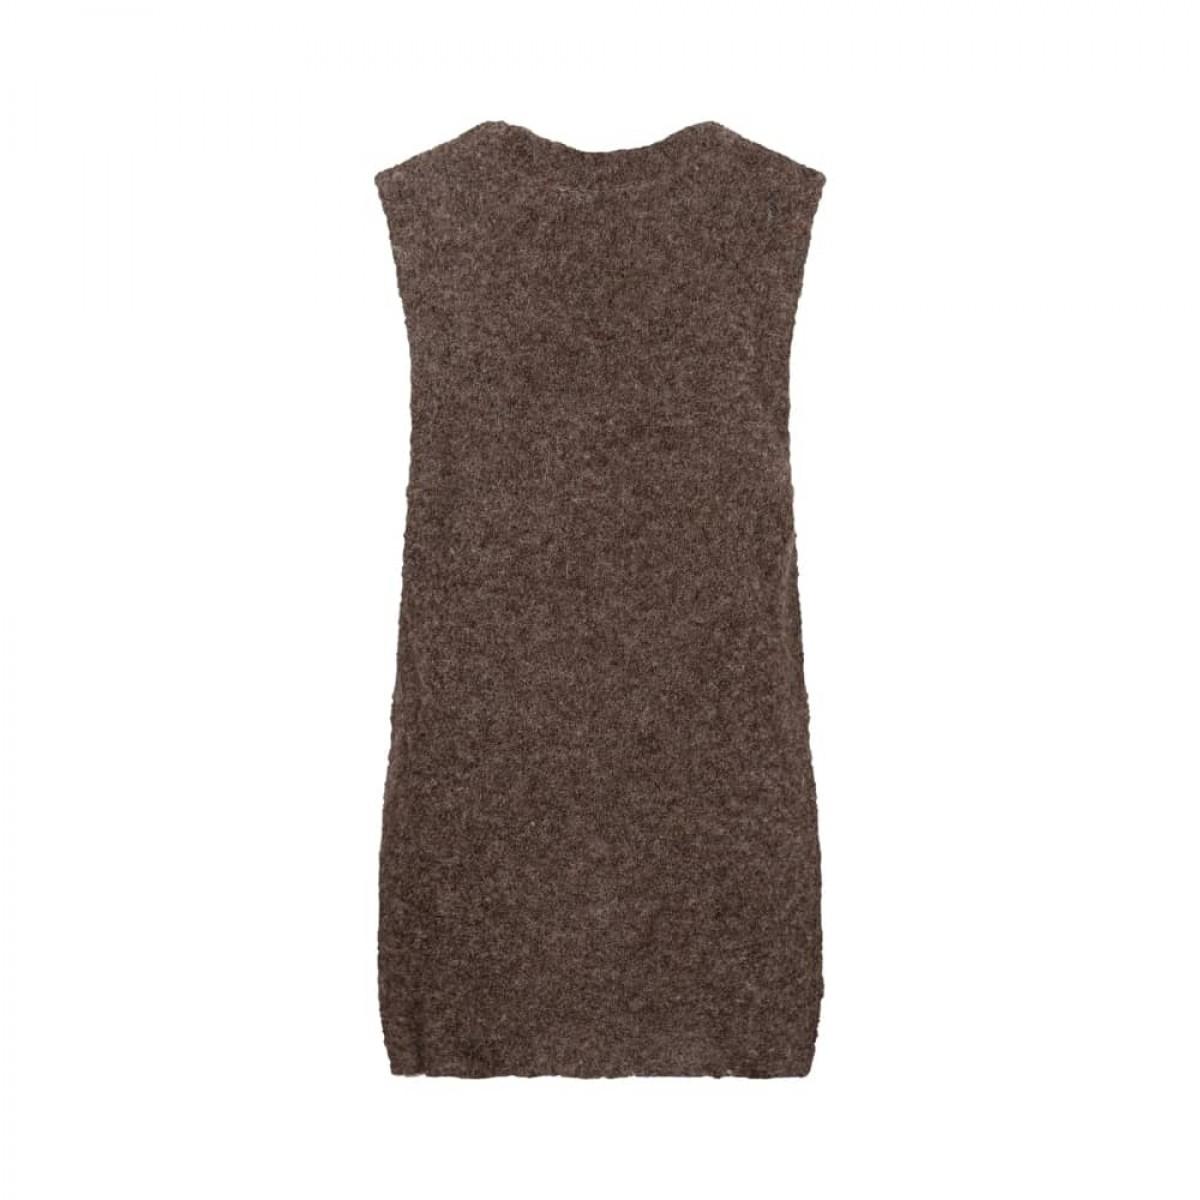 kia vest - soil brown - bag